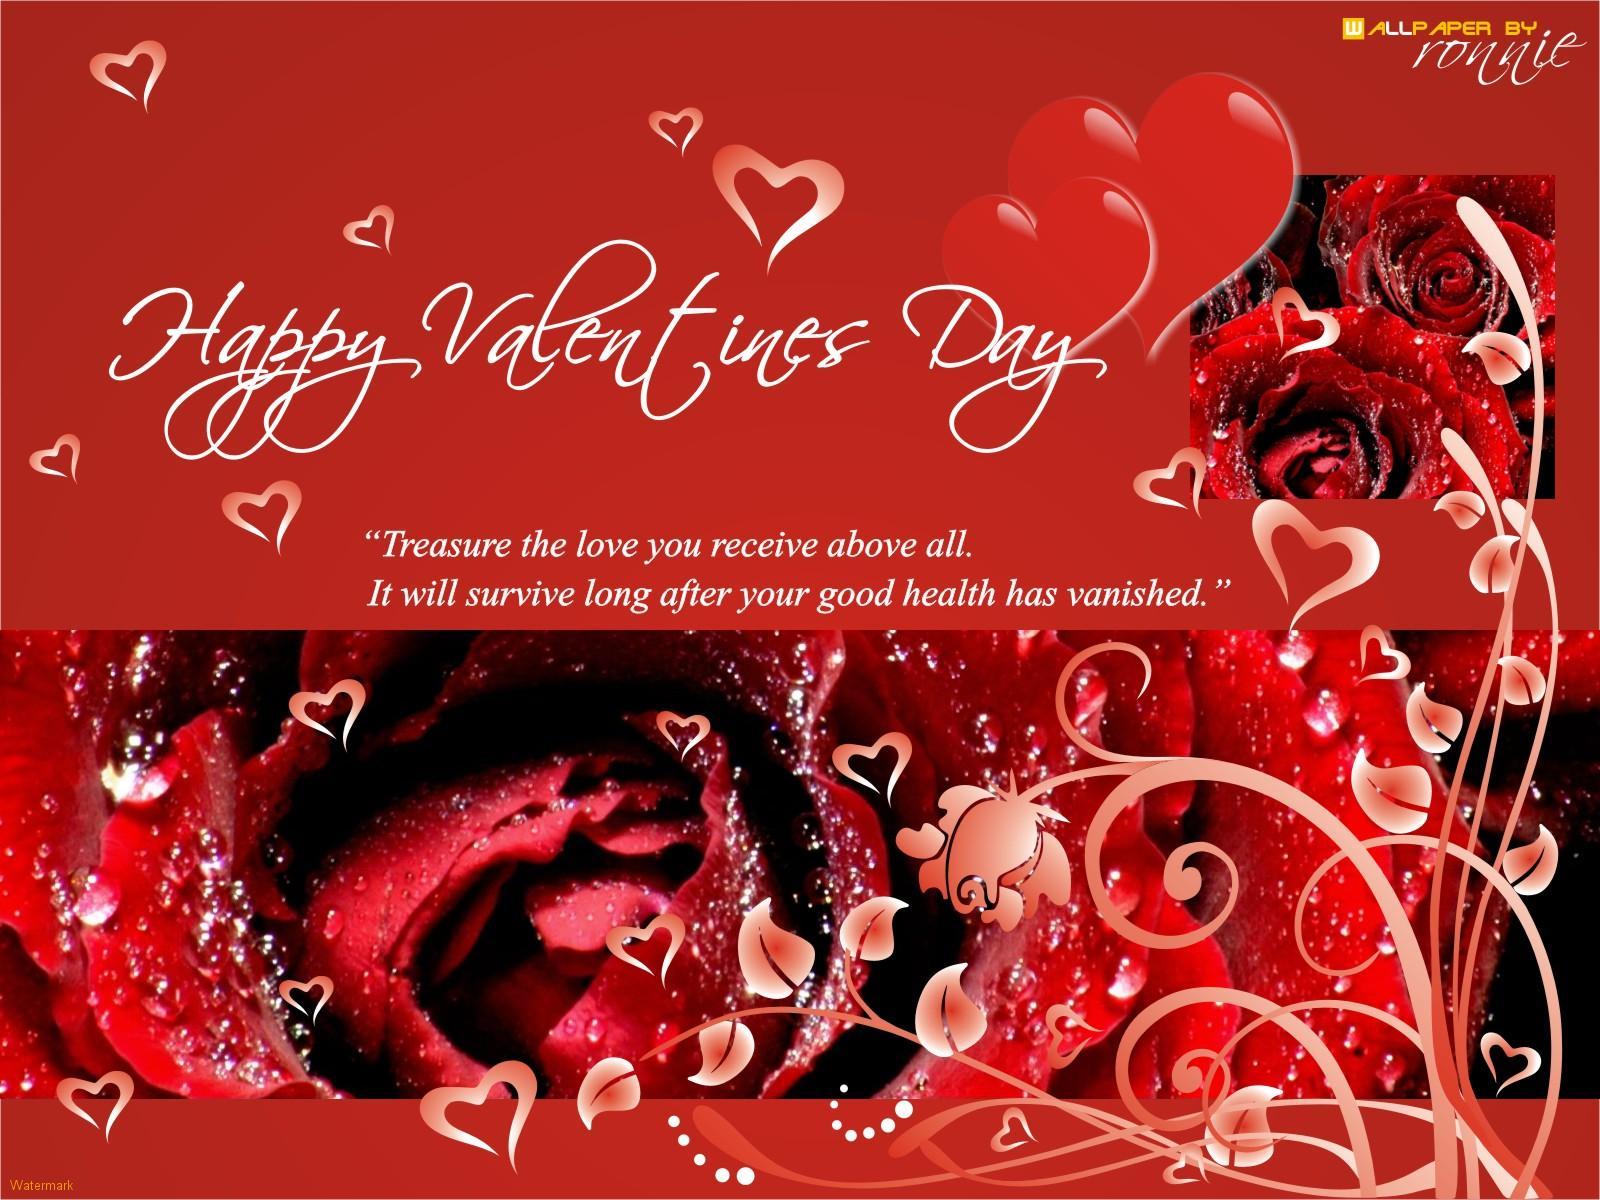 http://1.bp.blogspot.com/-MGTE3TKHxu0/Tv0ZLRra4BI/AAAAAAAAAHU/WcePfPk6Ojg/s1600/valentine-wallpaper-2.jpg